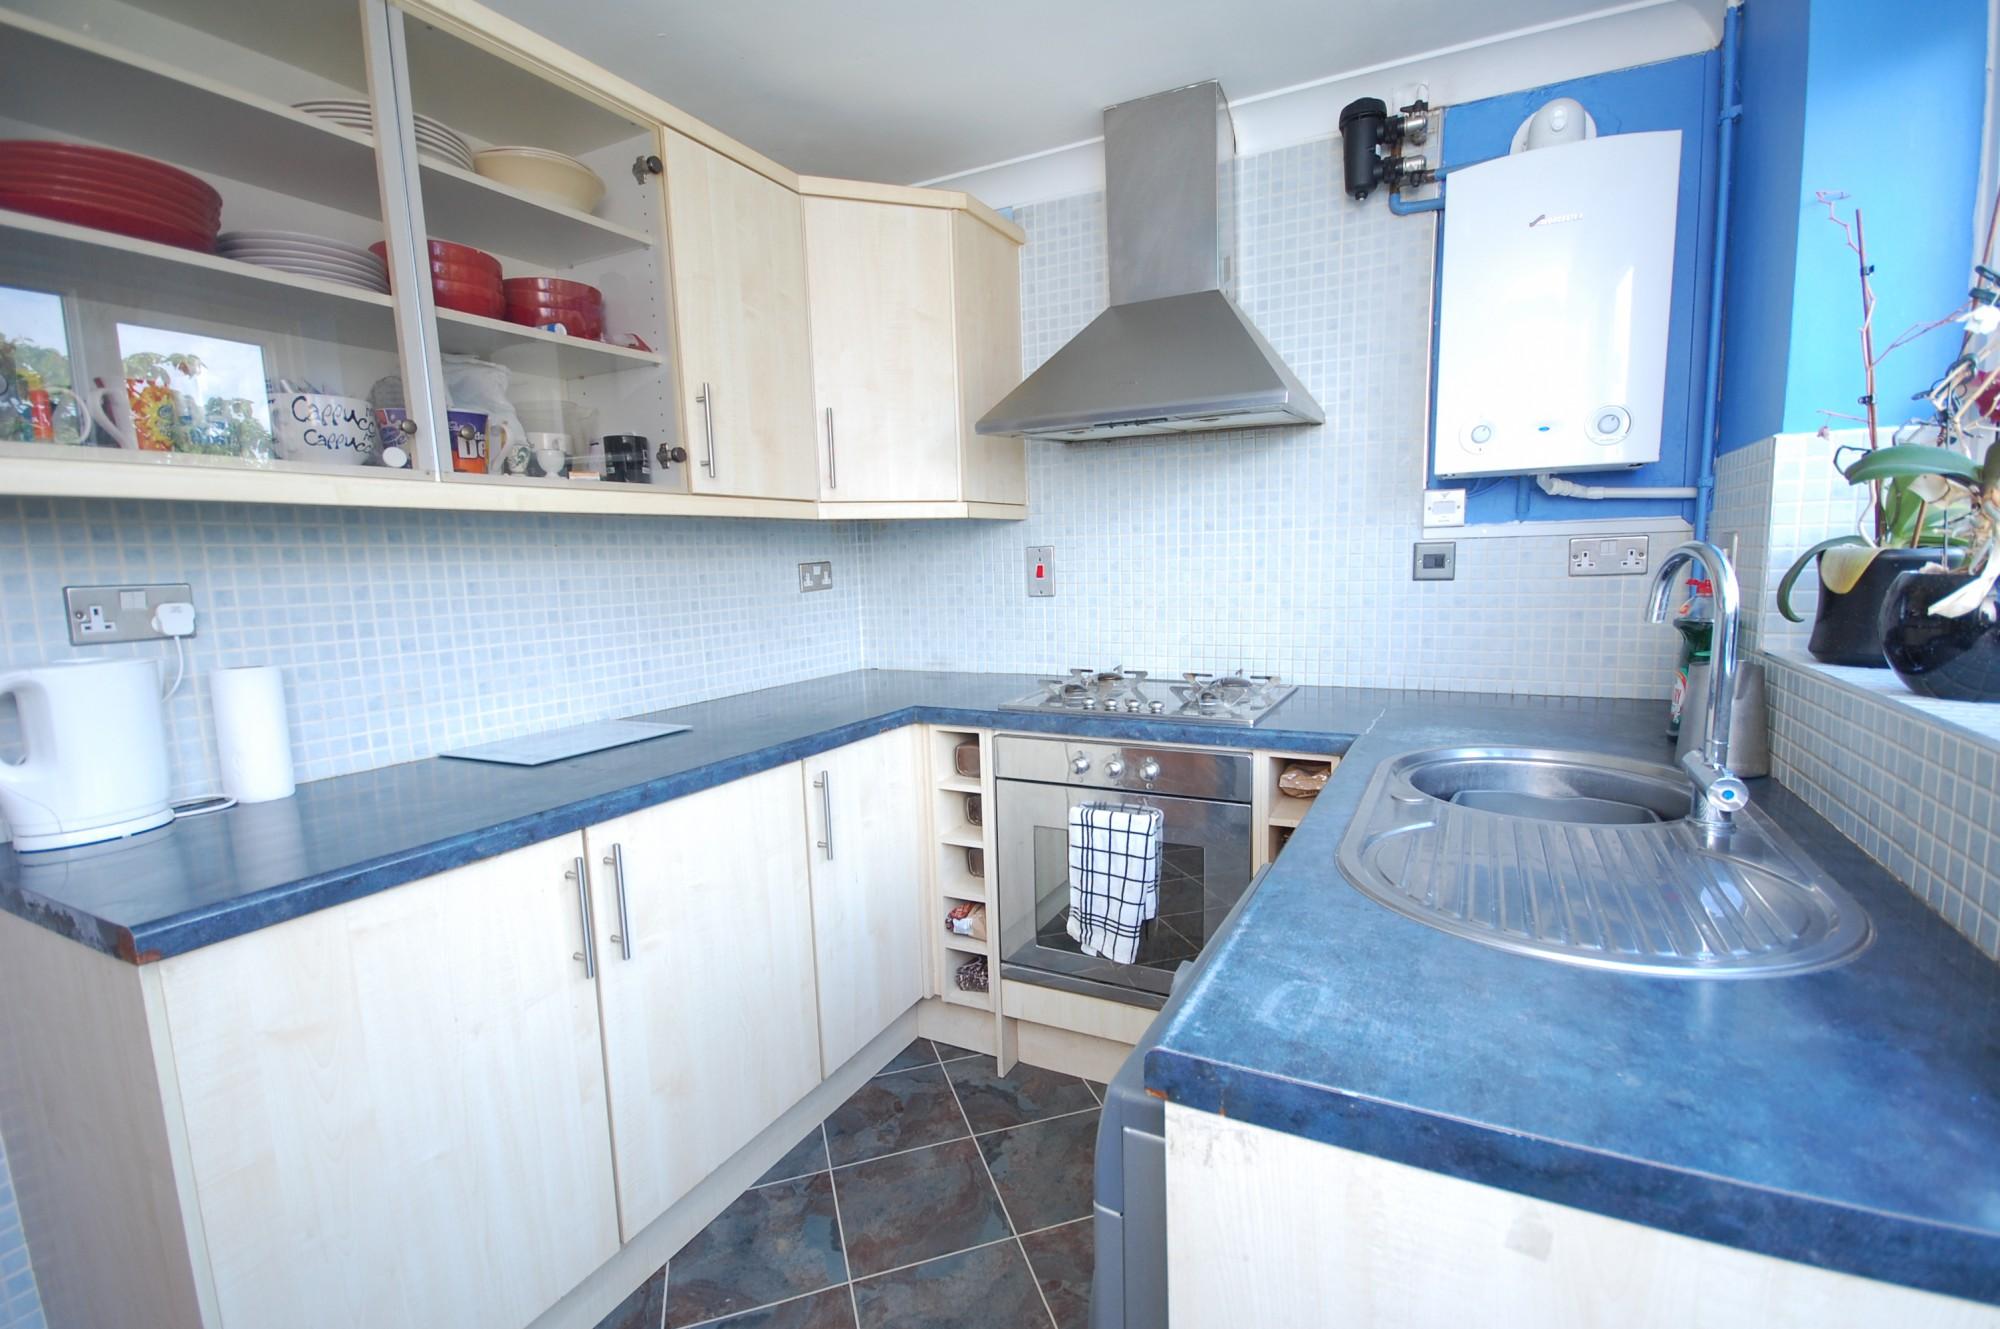 3 Bed House Siskin Close Colchester co4 - Patrick James Property ...